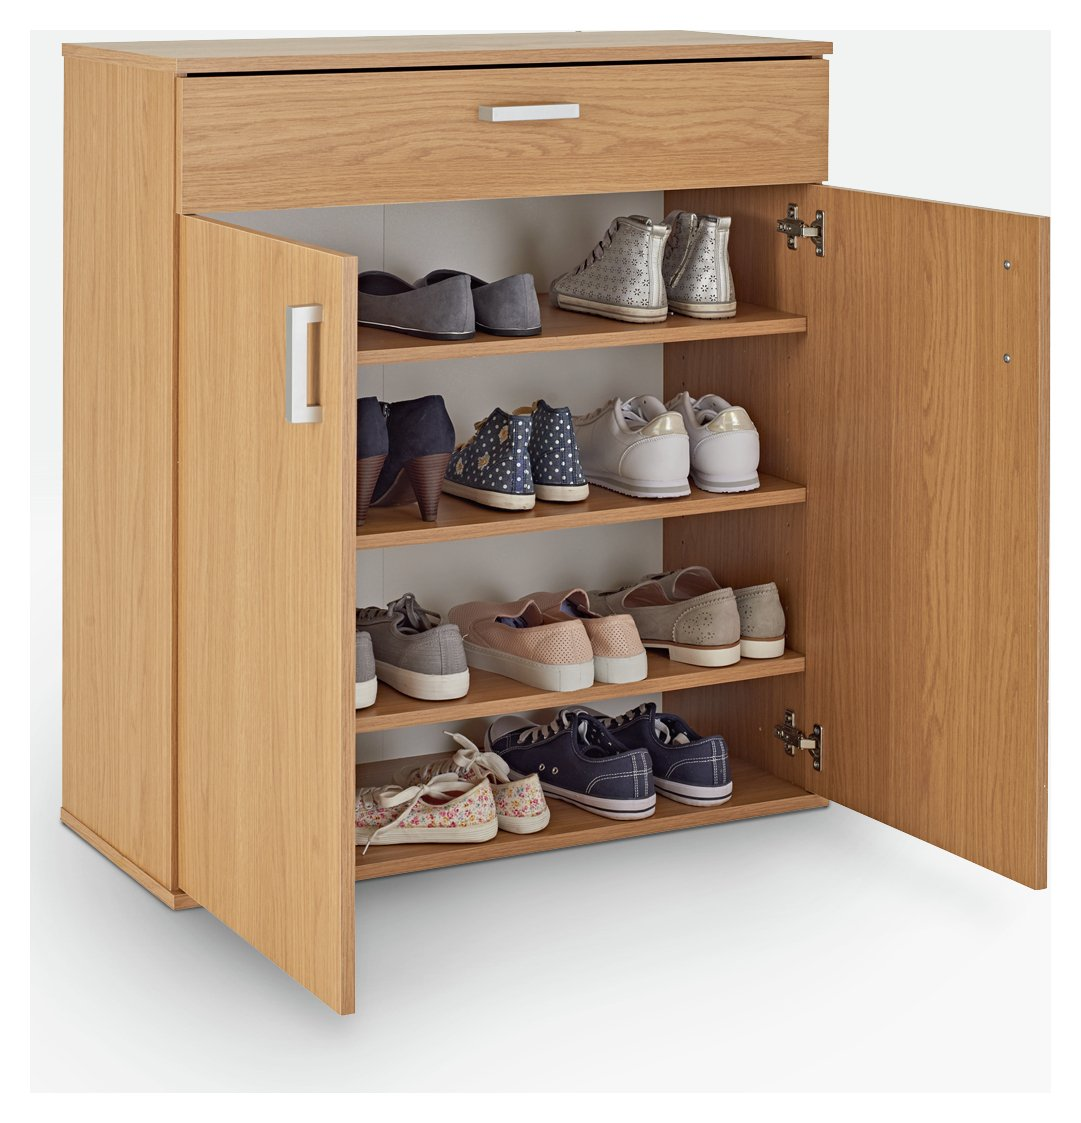 Buy HOME Venetia Shoe Storage Cabinet   Oak Effect At Argos.co.uk   Your  Online Shop For Hallway Storage, Hallway Furniture, Home And Garden.